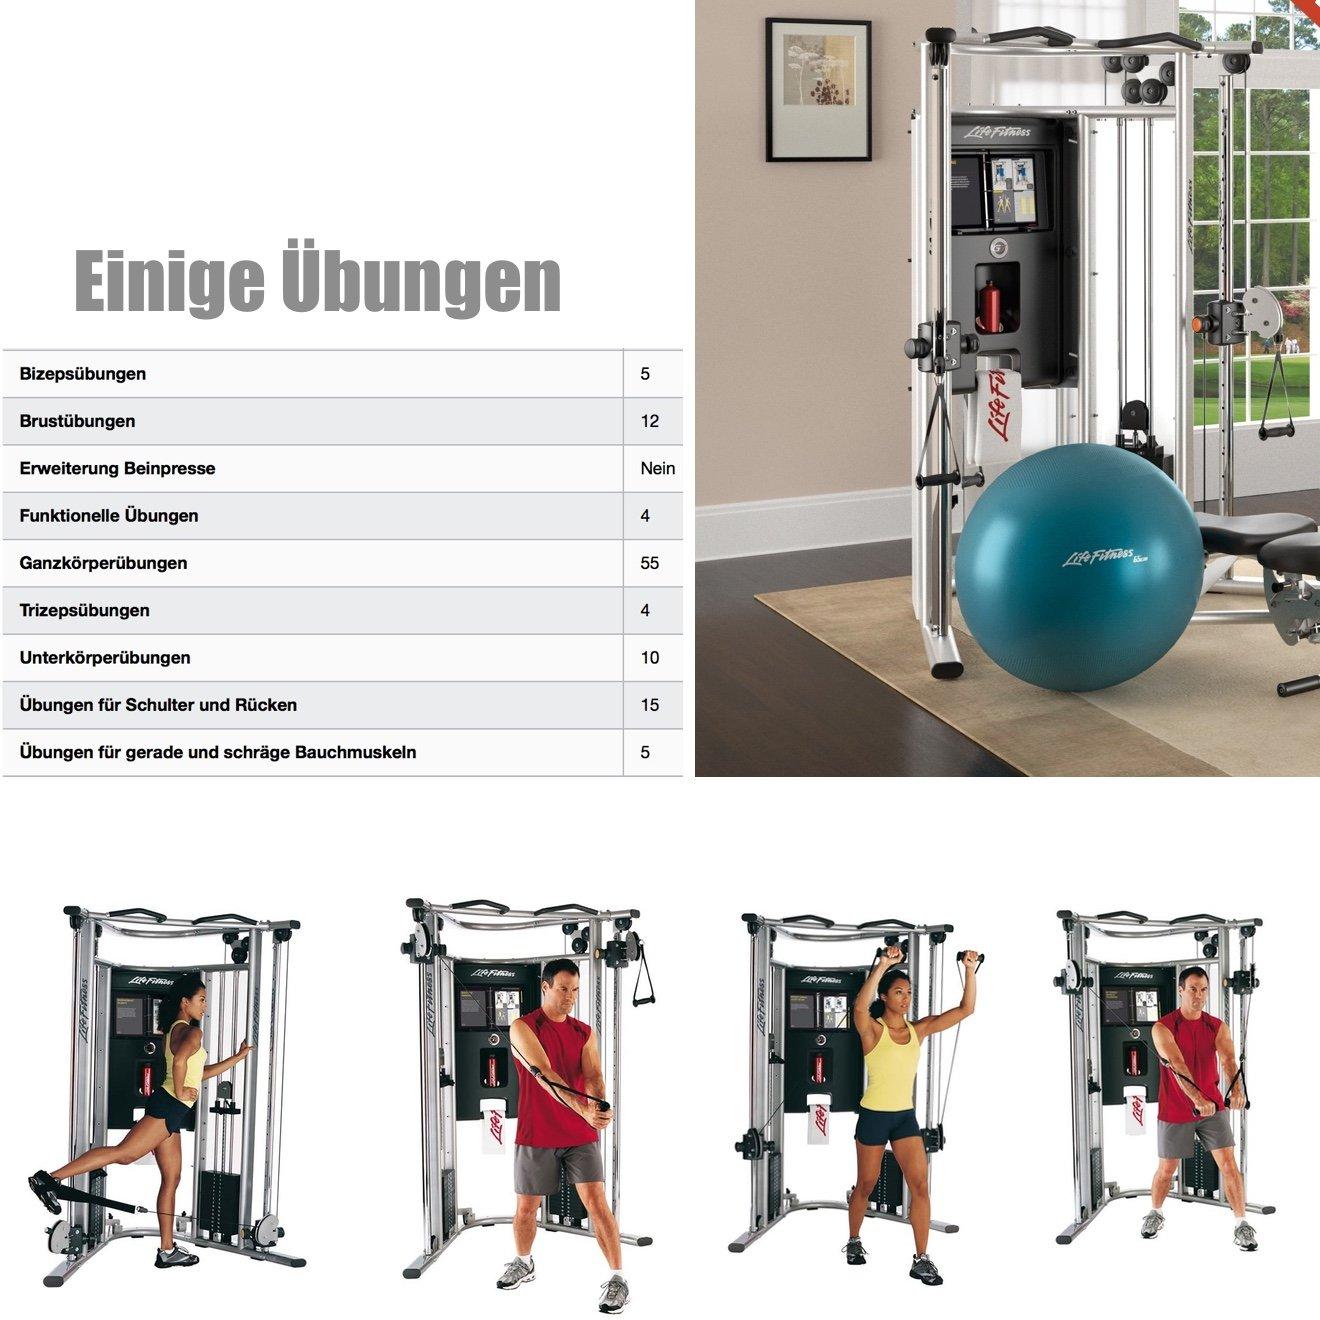 Life fitness G7 multi station - mehg - fitness station con banco de pesas: Amazon.es: Deportes y aire libre